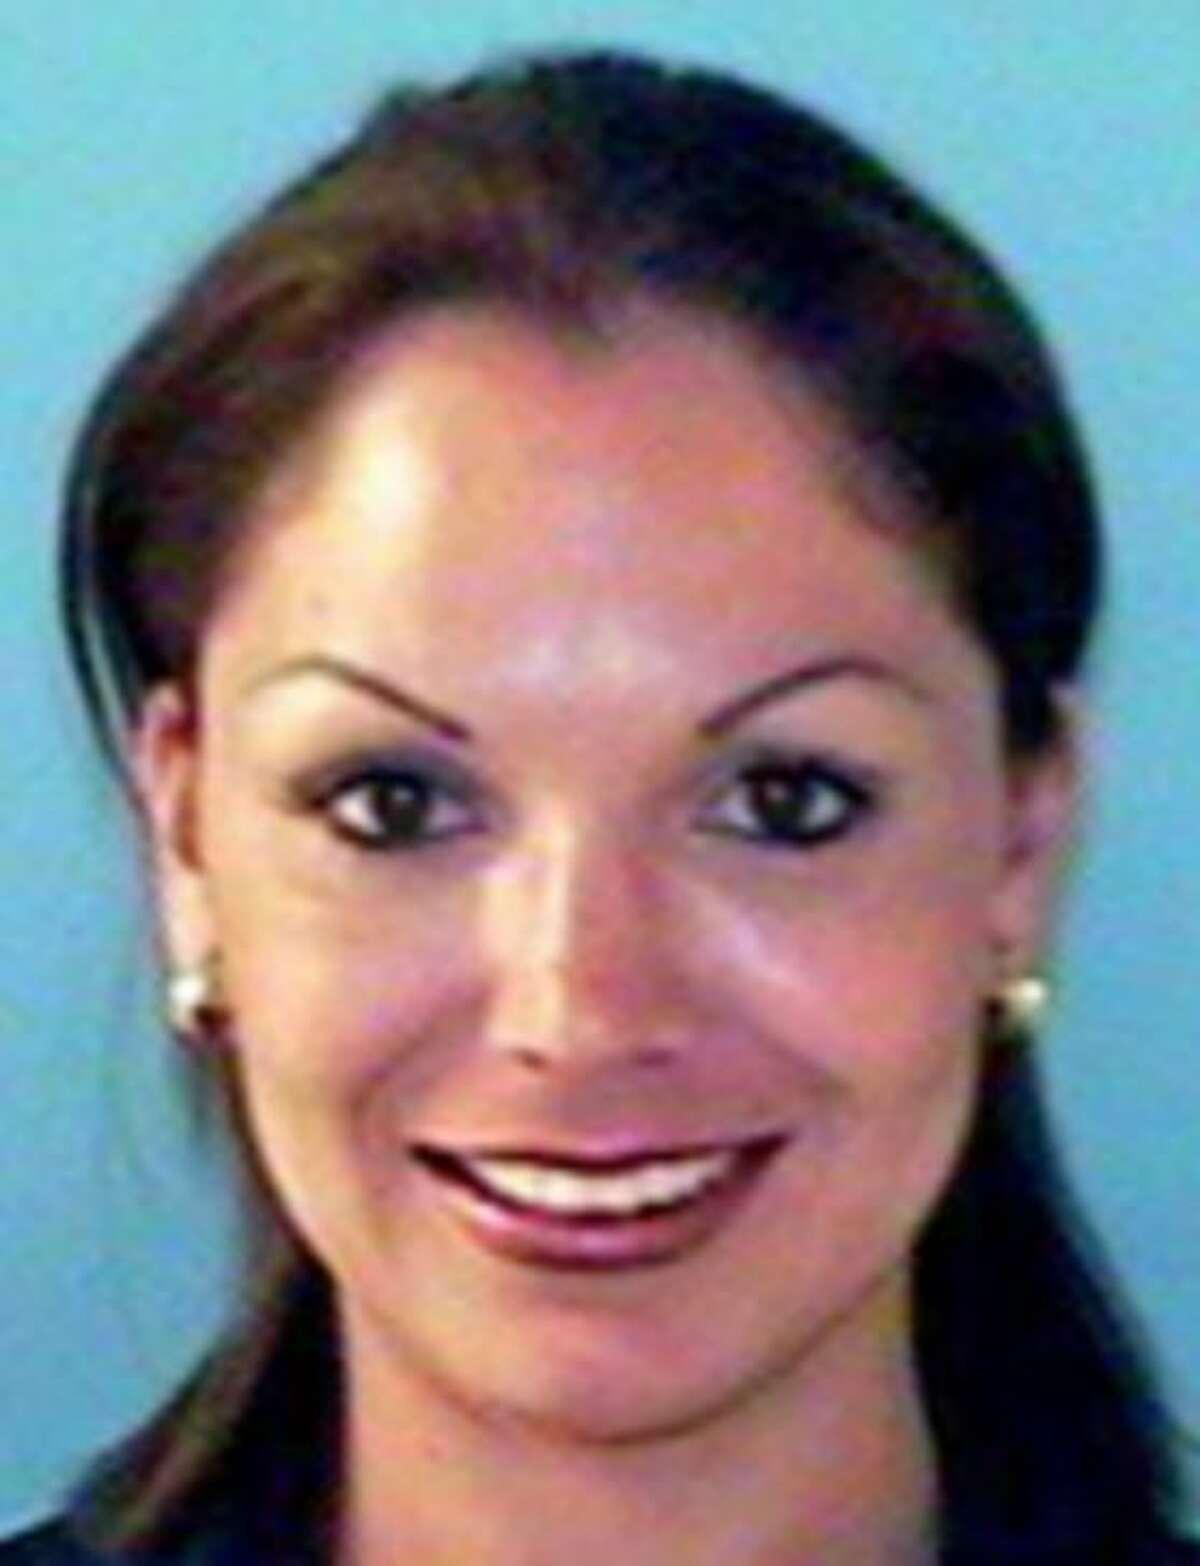 Clarisa Zazueta-PerezAlias: n/aWanted for: Conspiracy to defraud financial institutionsLast known location: El Paso, Texas